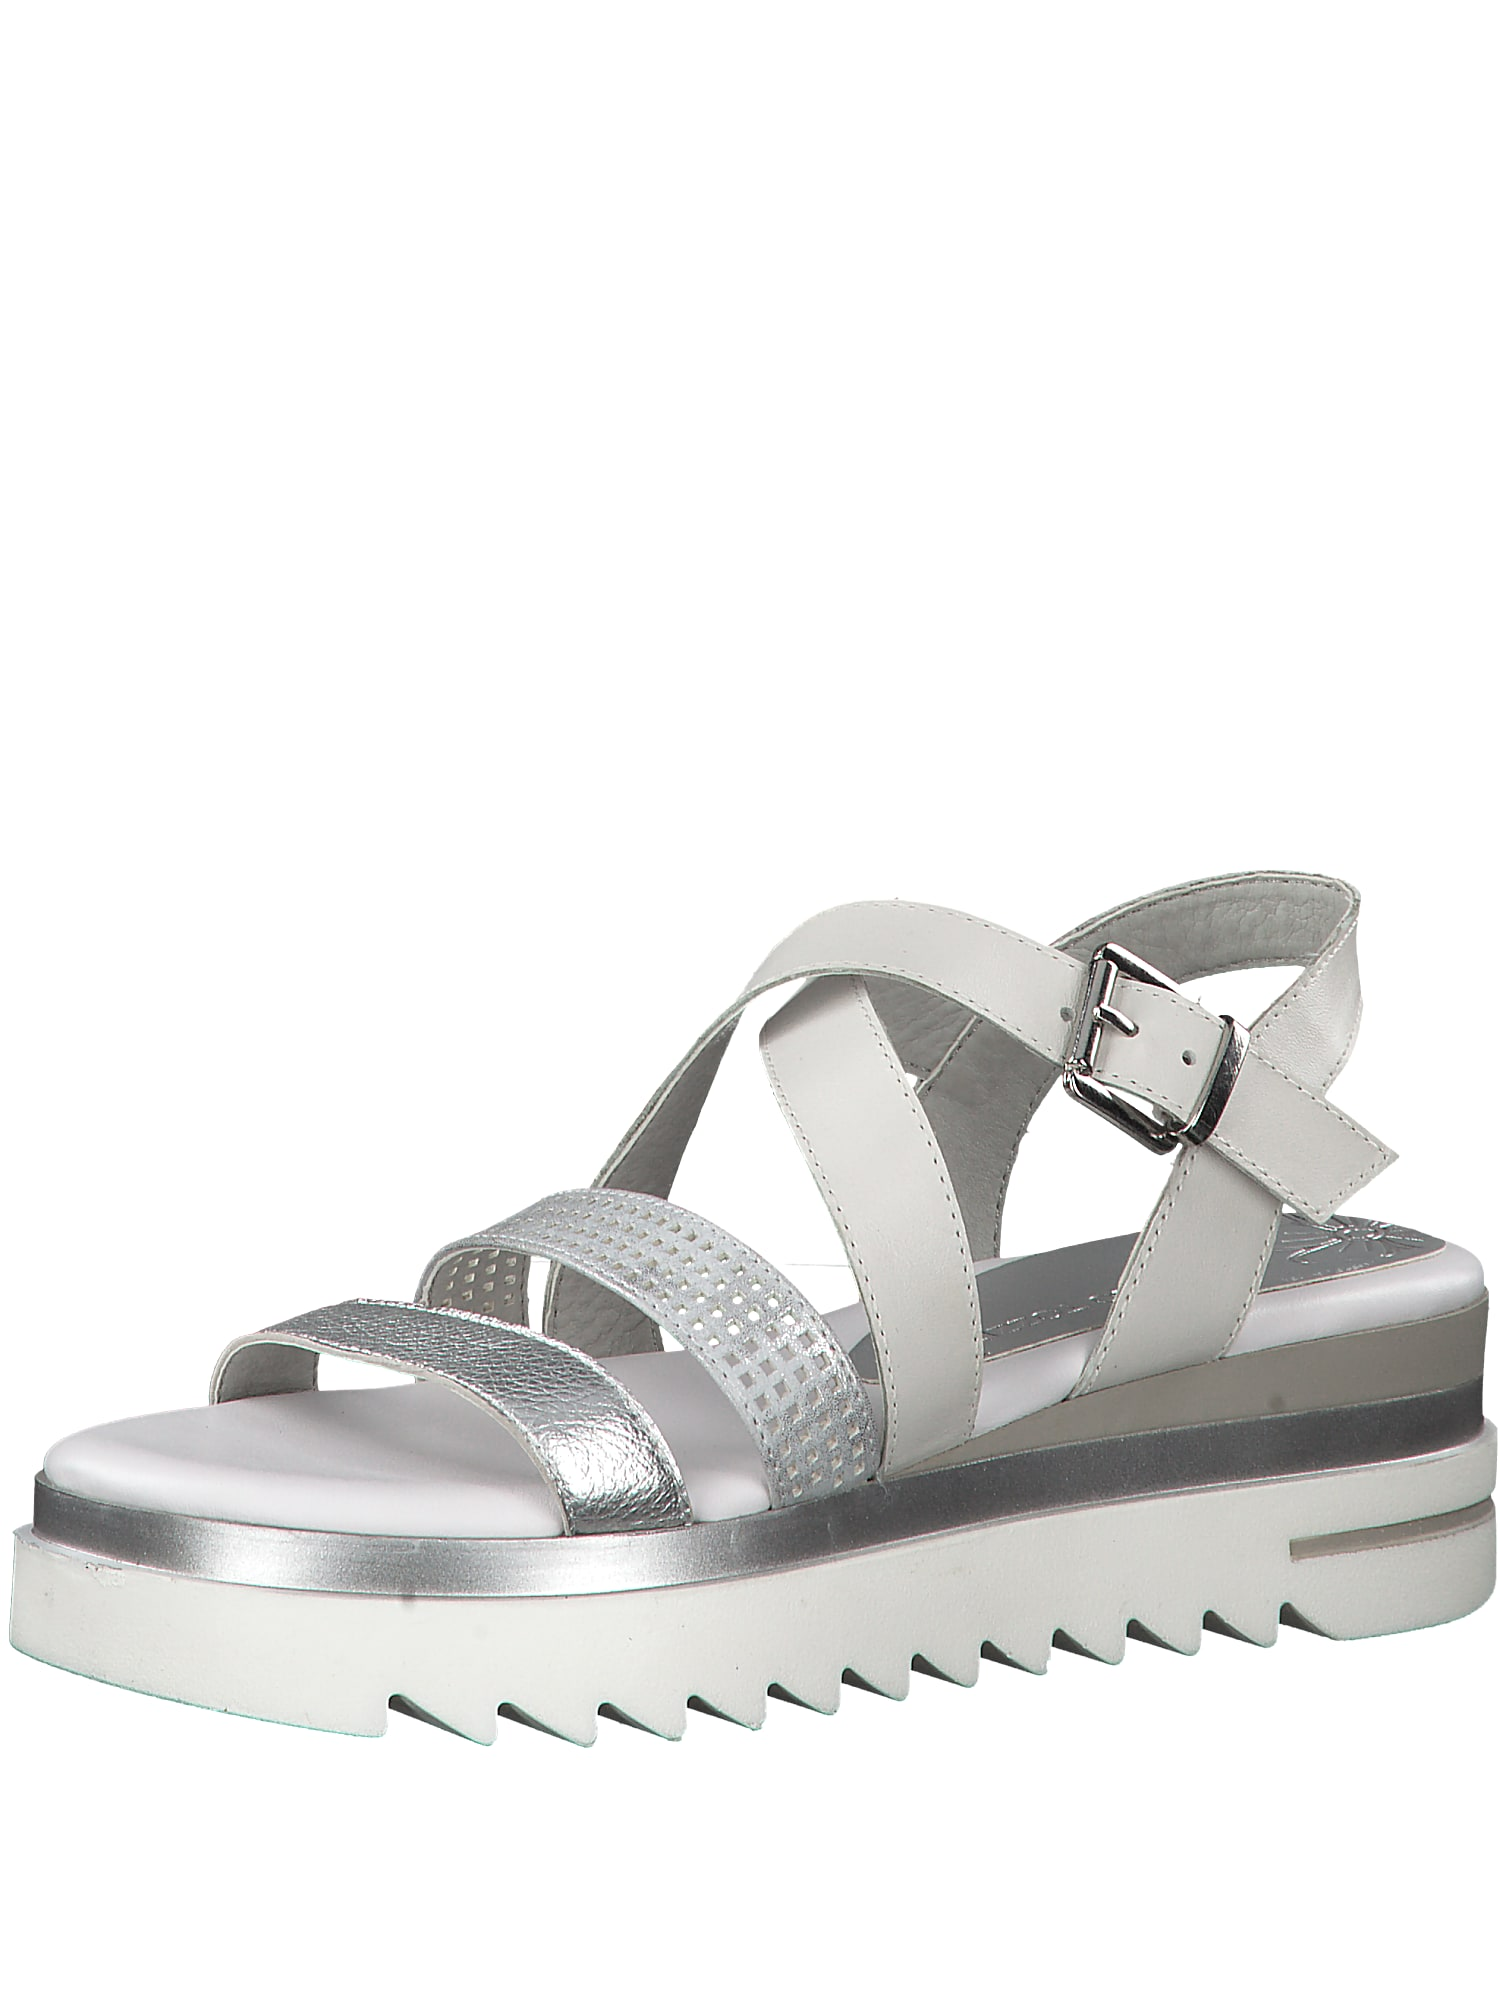 Sandály stříbrná bílá MARCO TOZZI